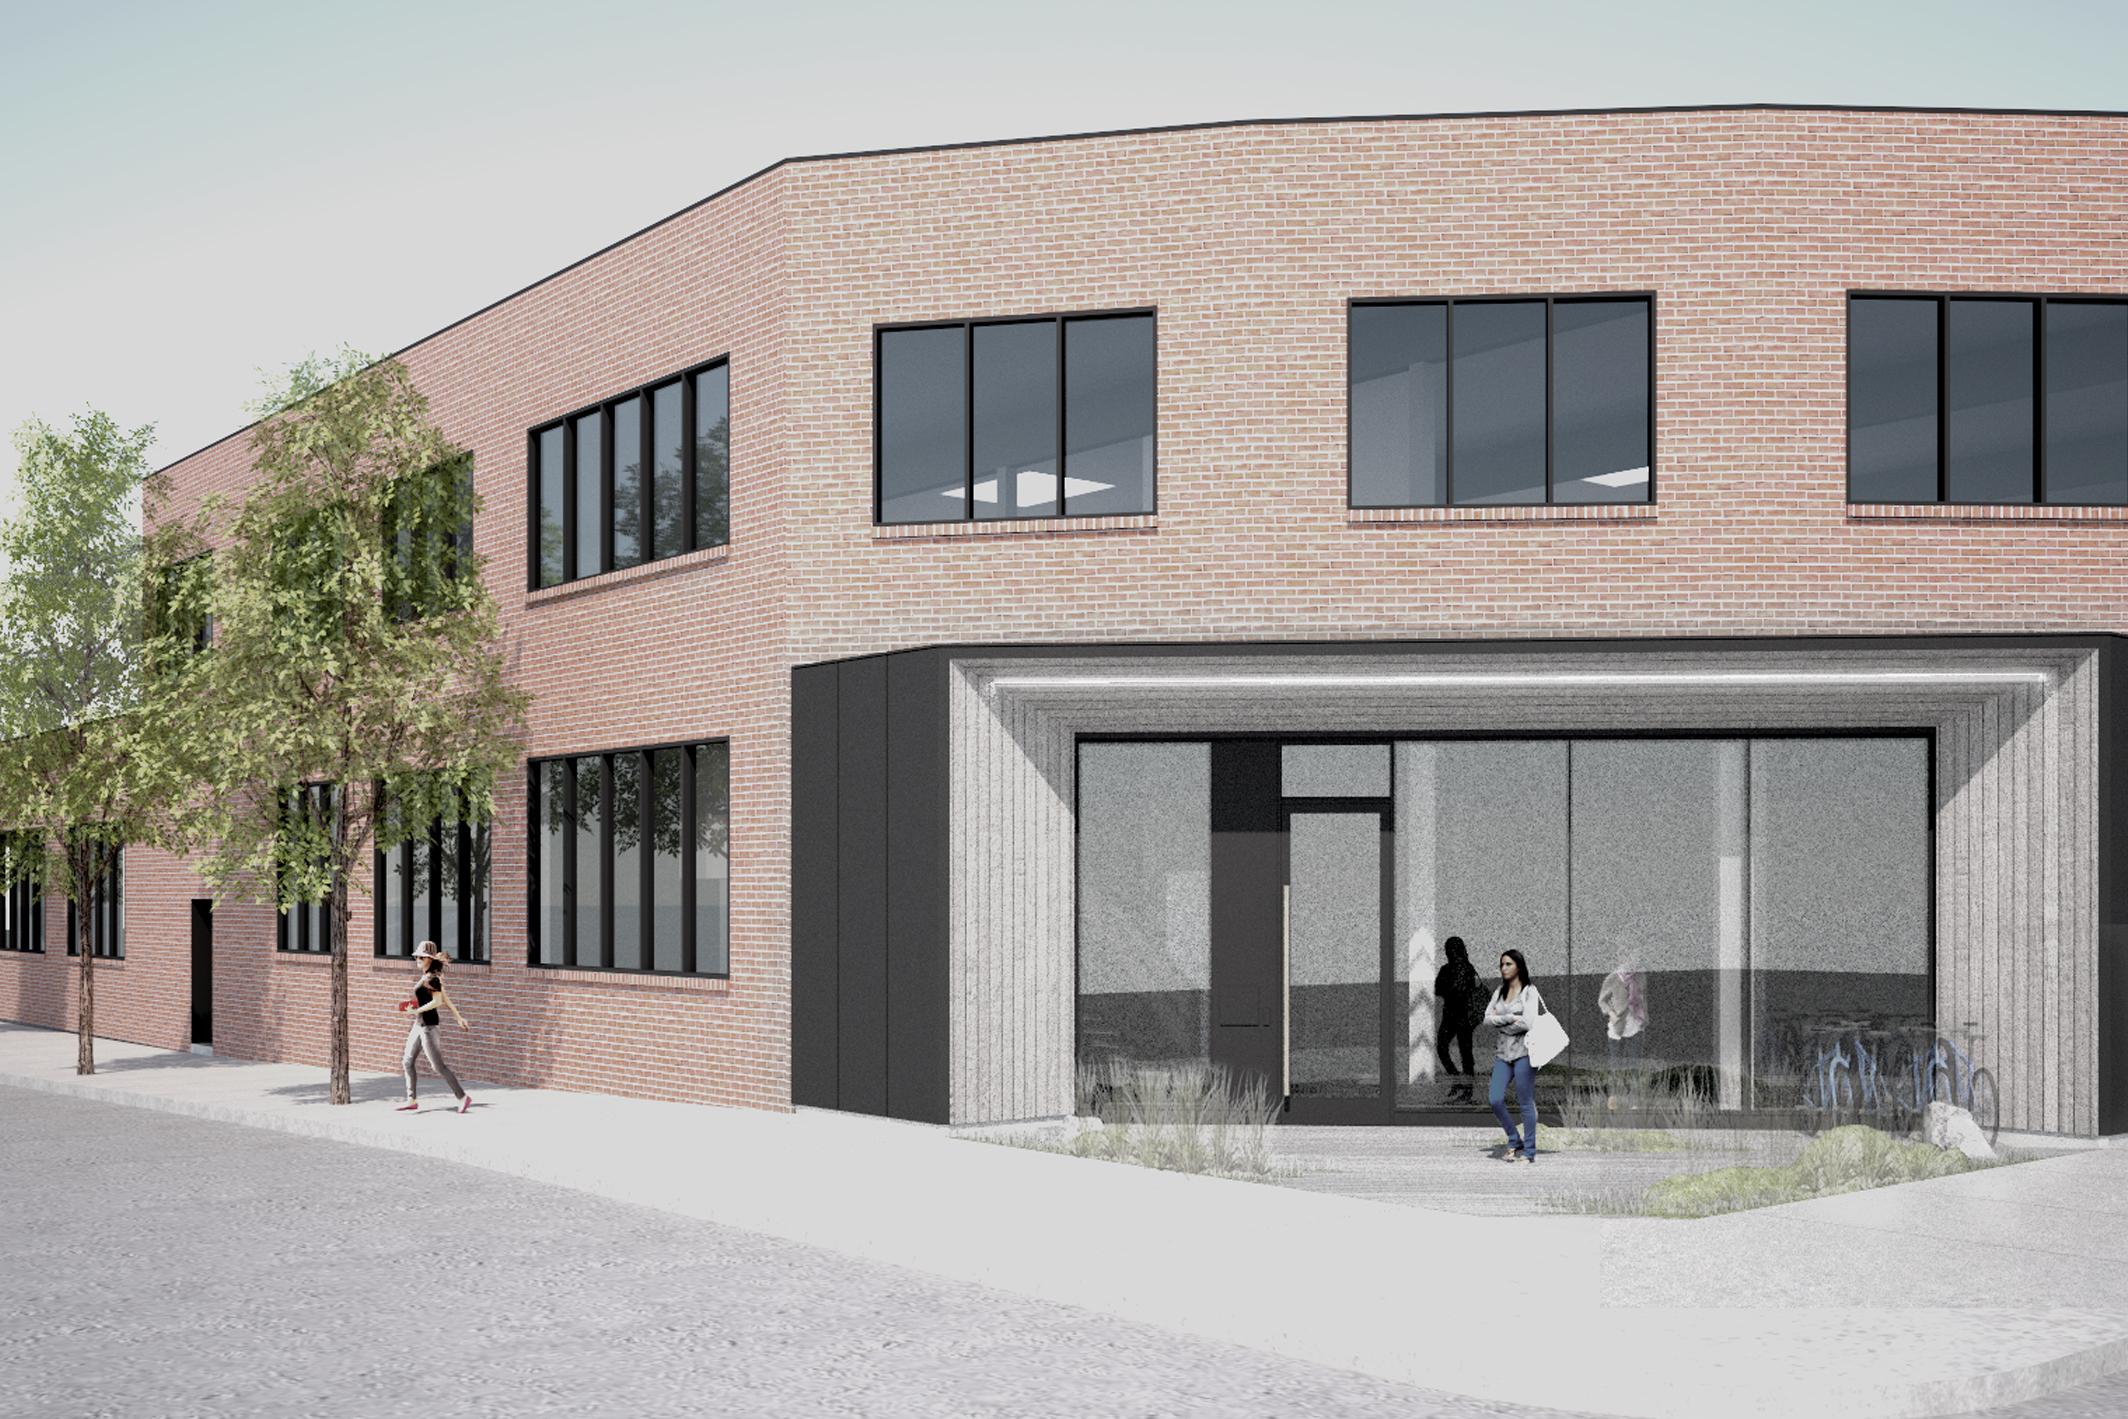 rendering, pettygrove brick office building storefront, large entry door